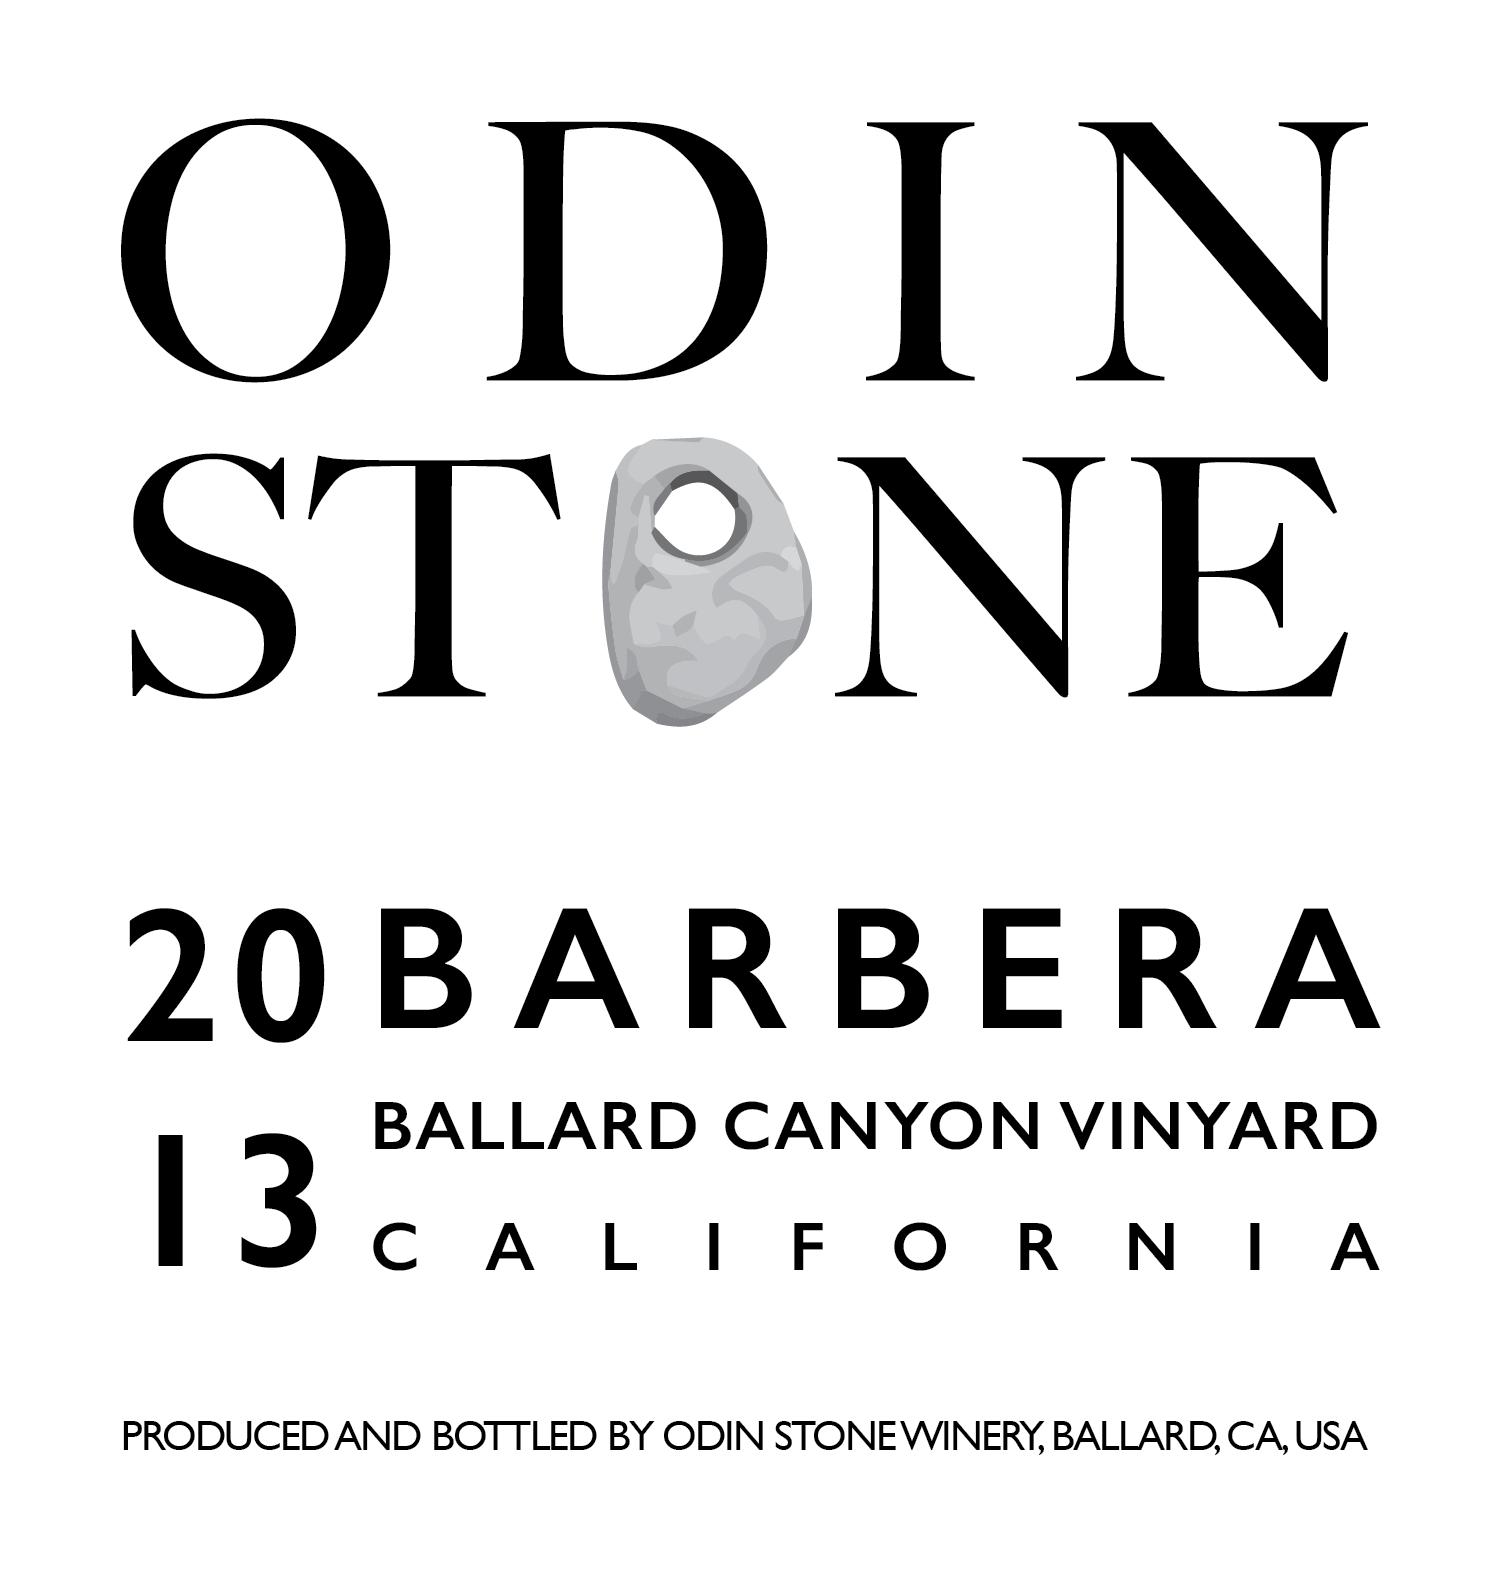 odin_stone_label-2.png